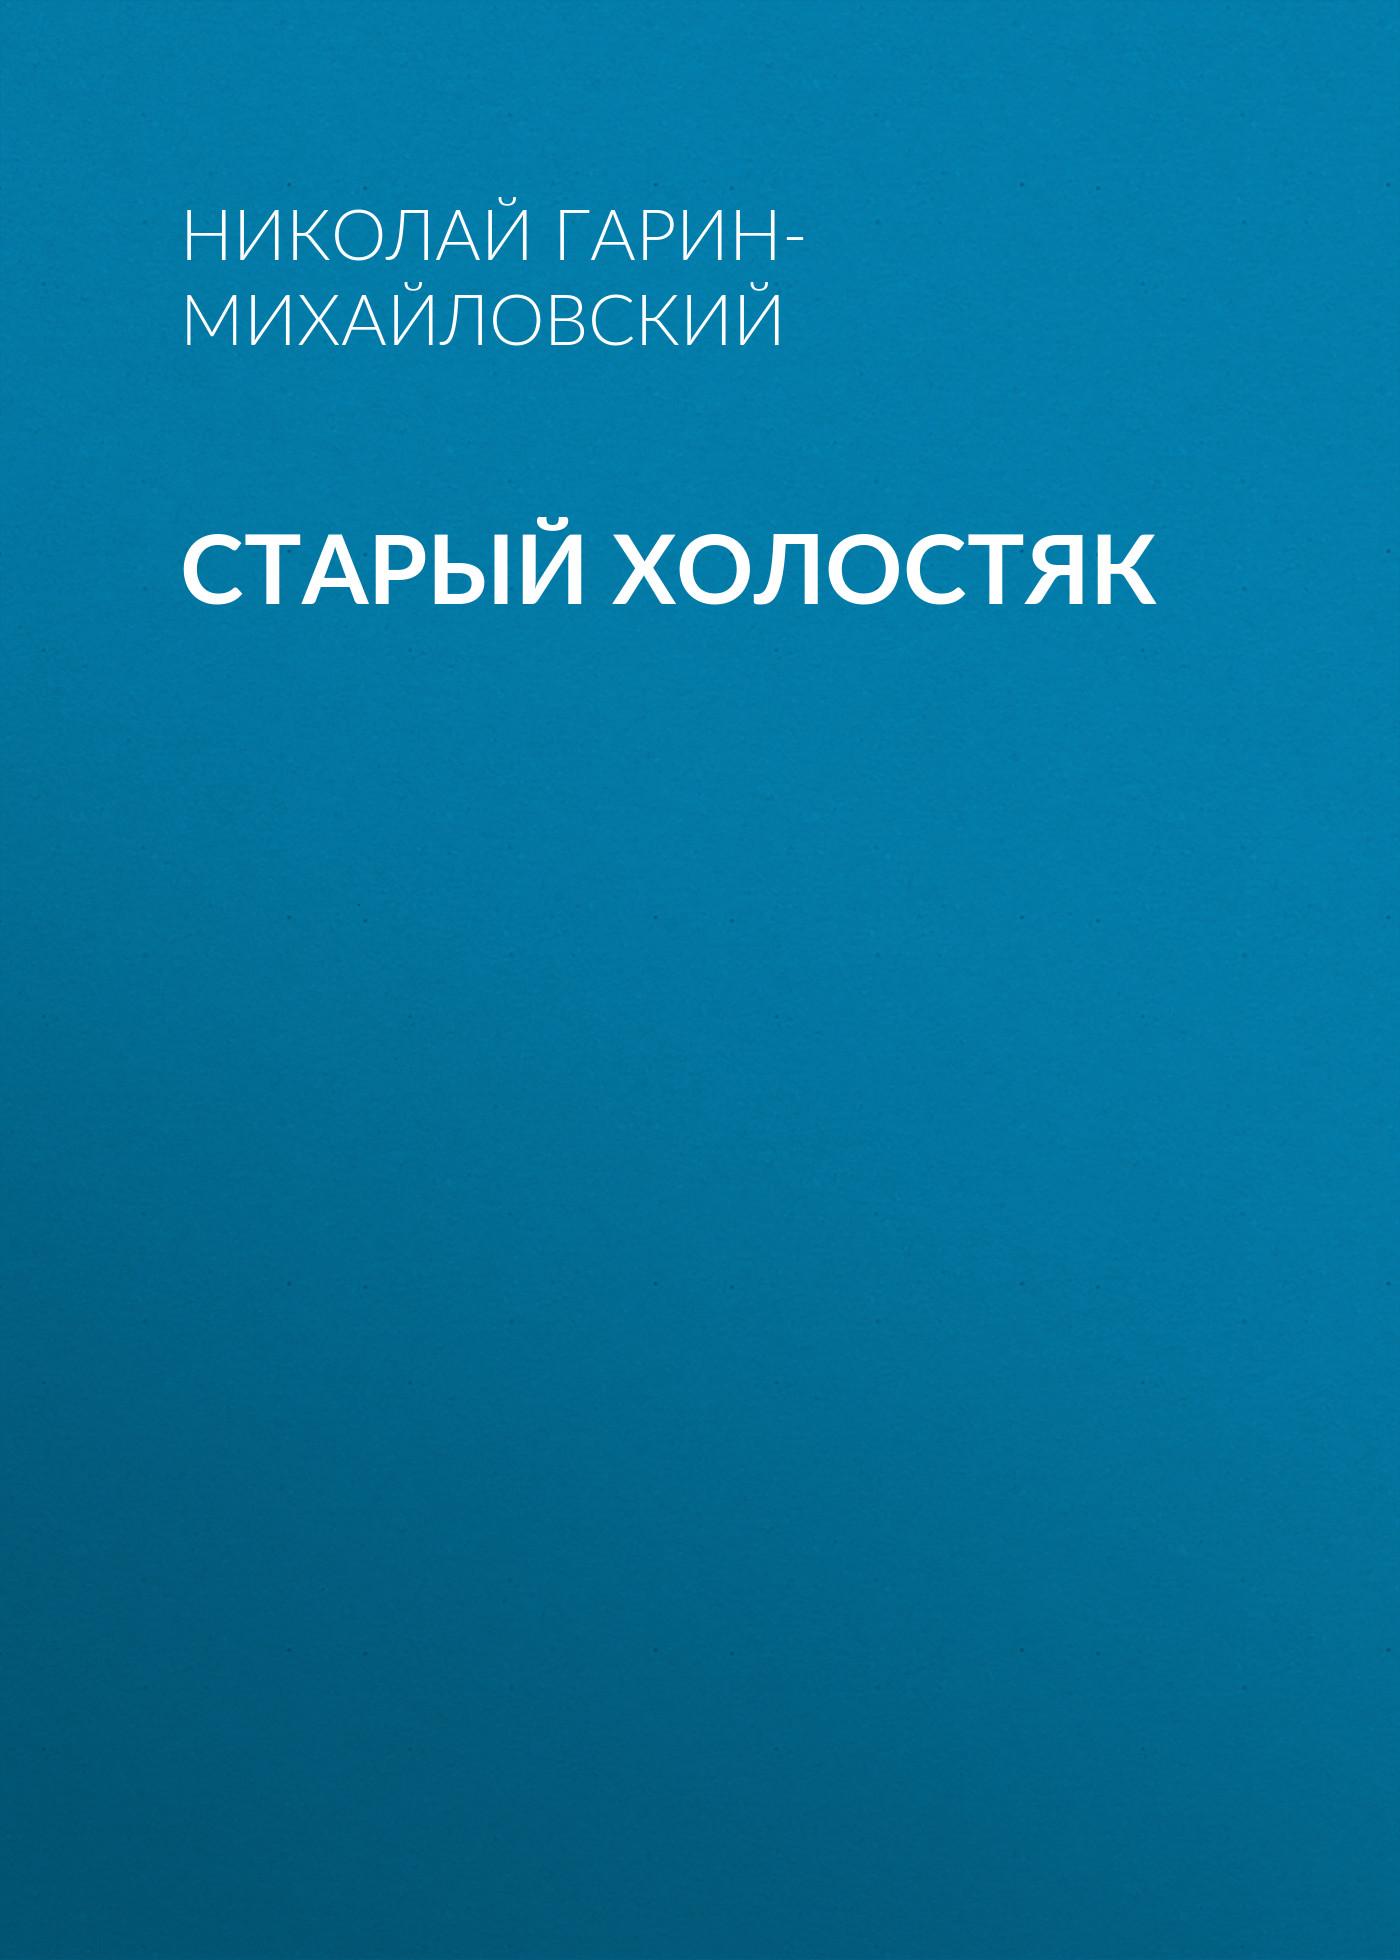 Николай Гарин-Михайловский Старый холостяк цена